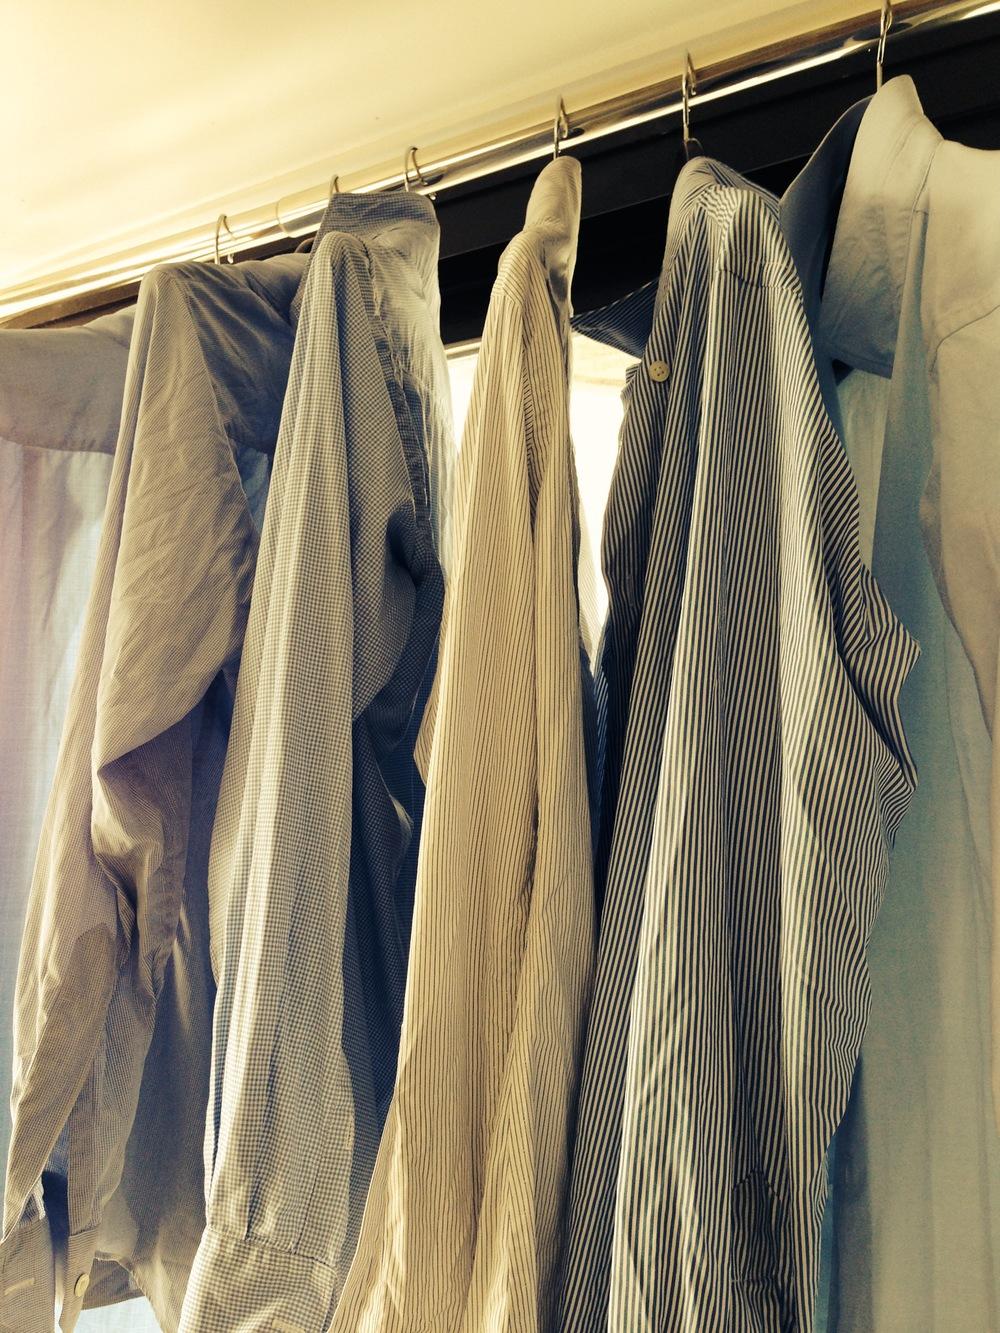 An ambitious half dozen for the advanced shirt launderer.